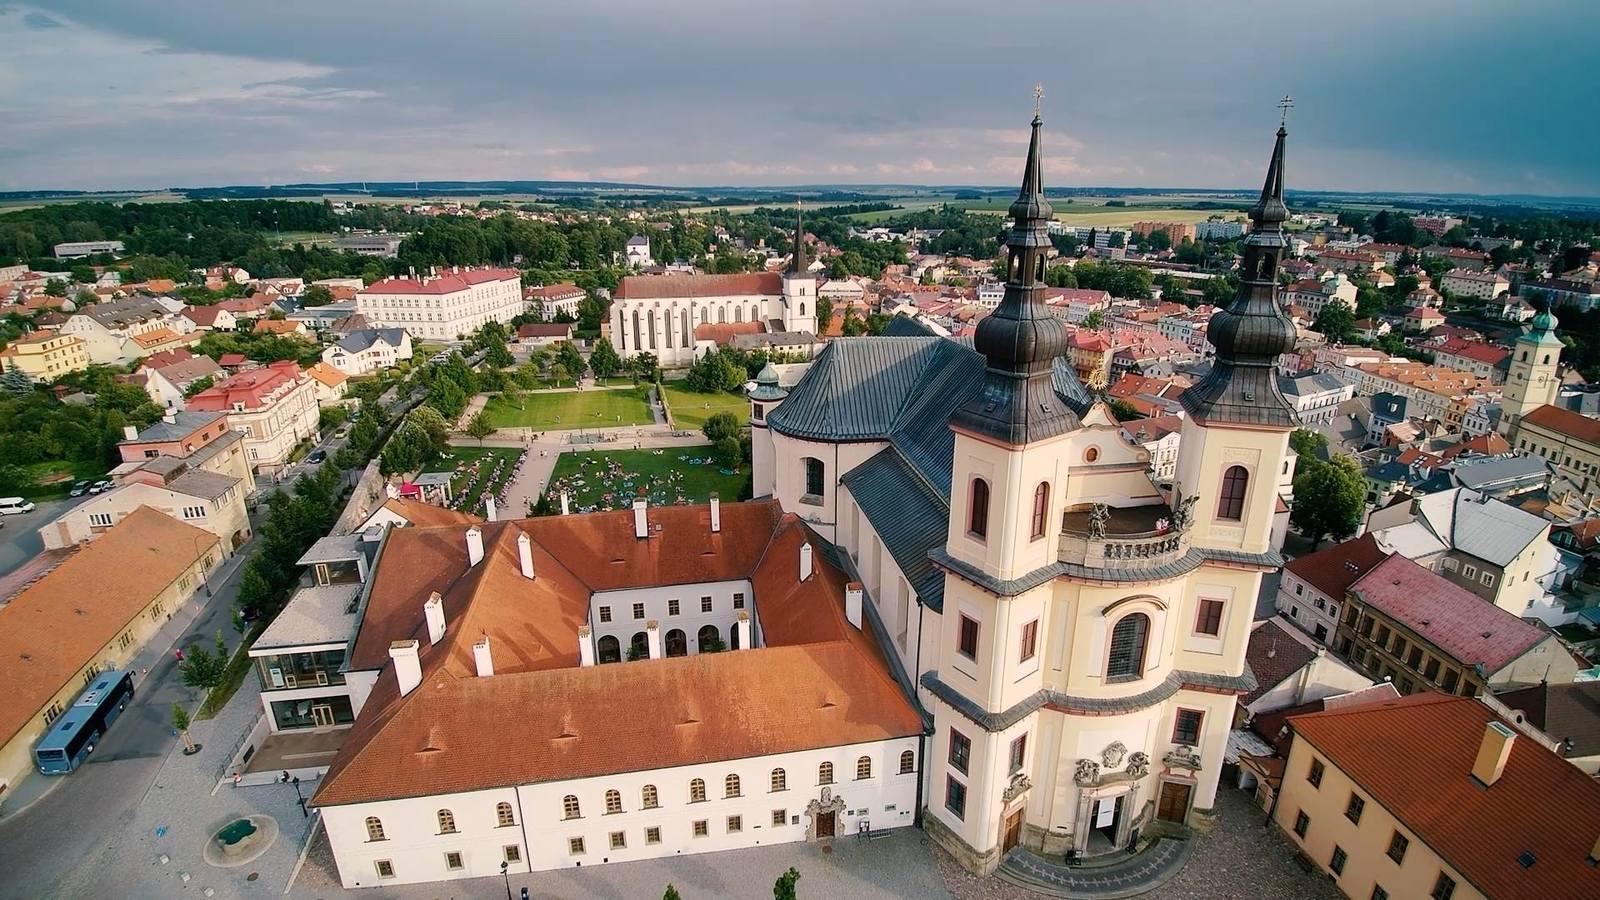 The 60th Jubilee Of The Festival Smetana S Litomyšl 14 6 7 7 2018